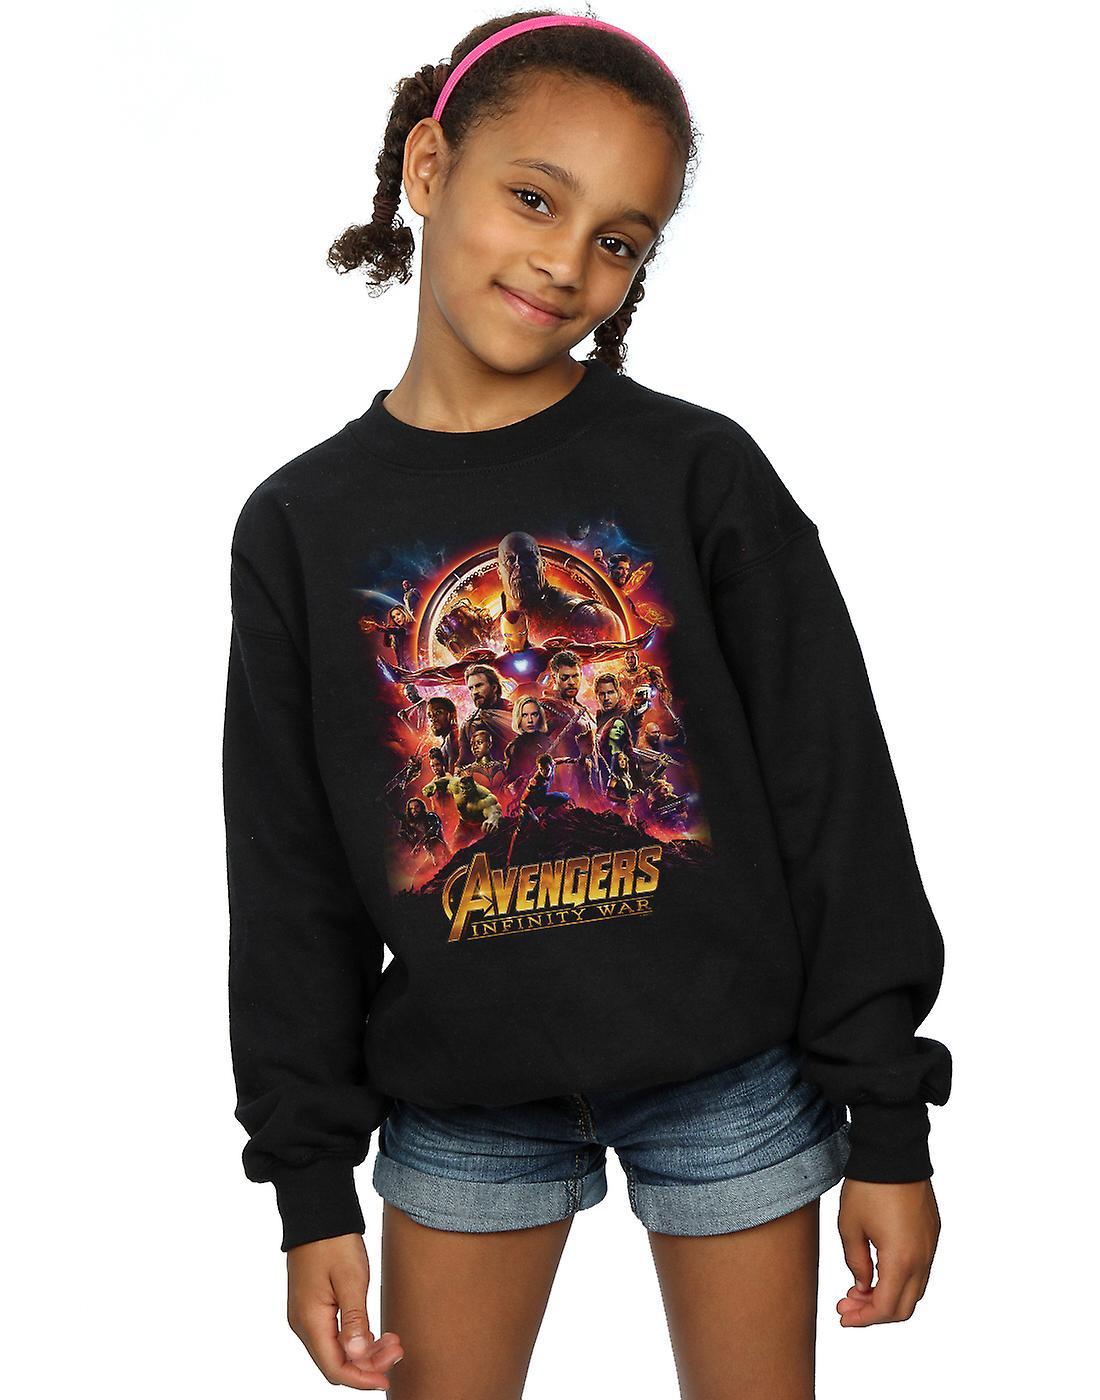 Marvel Girls Avengers Infinity War Movie Poster Sweatshirt